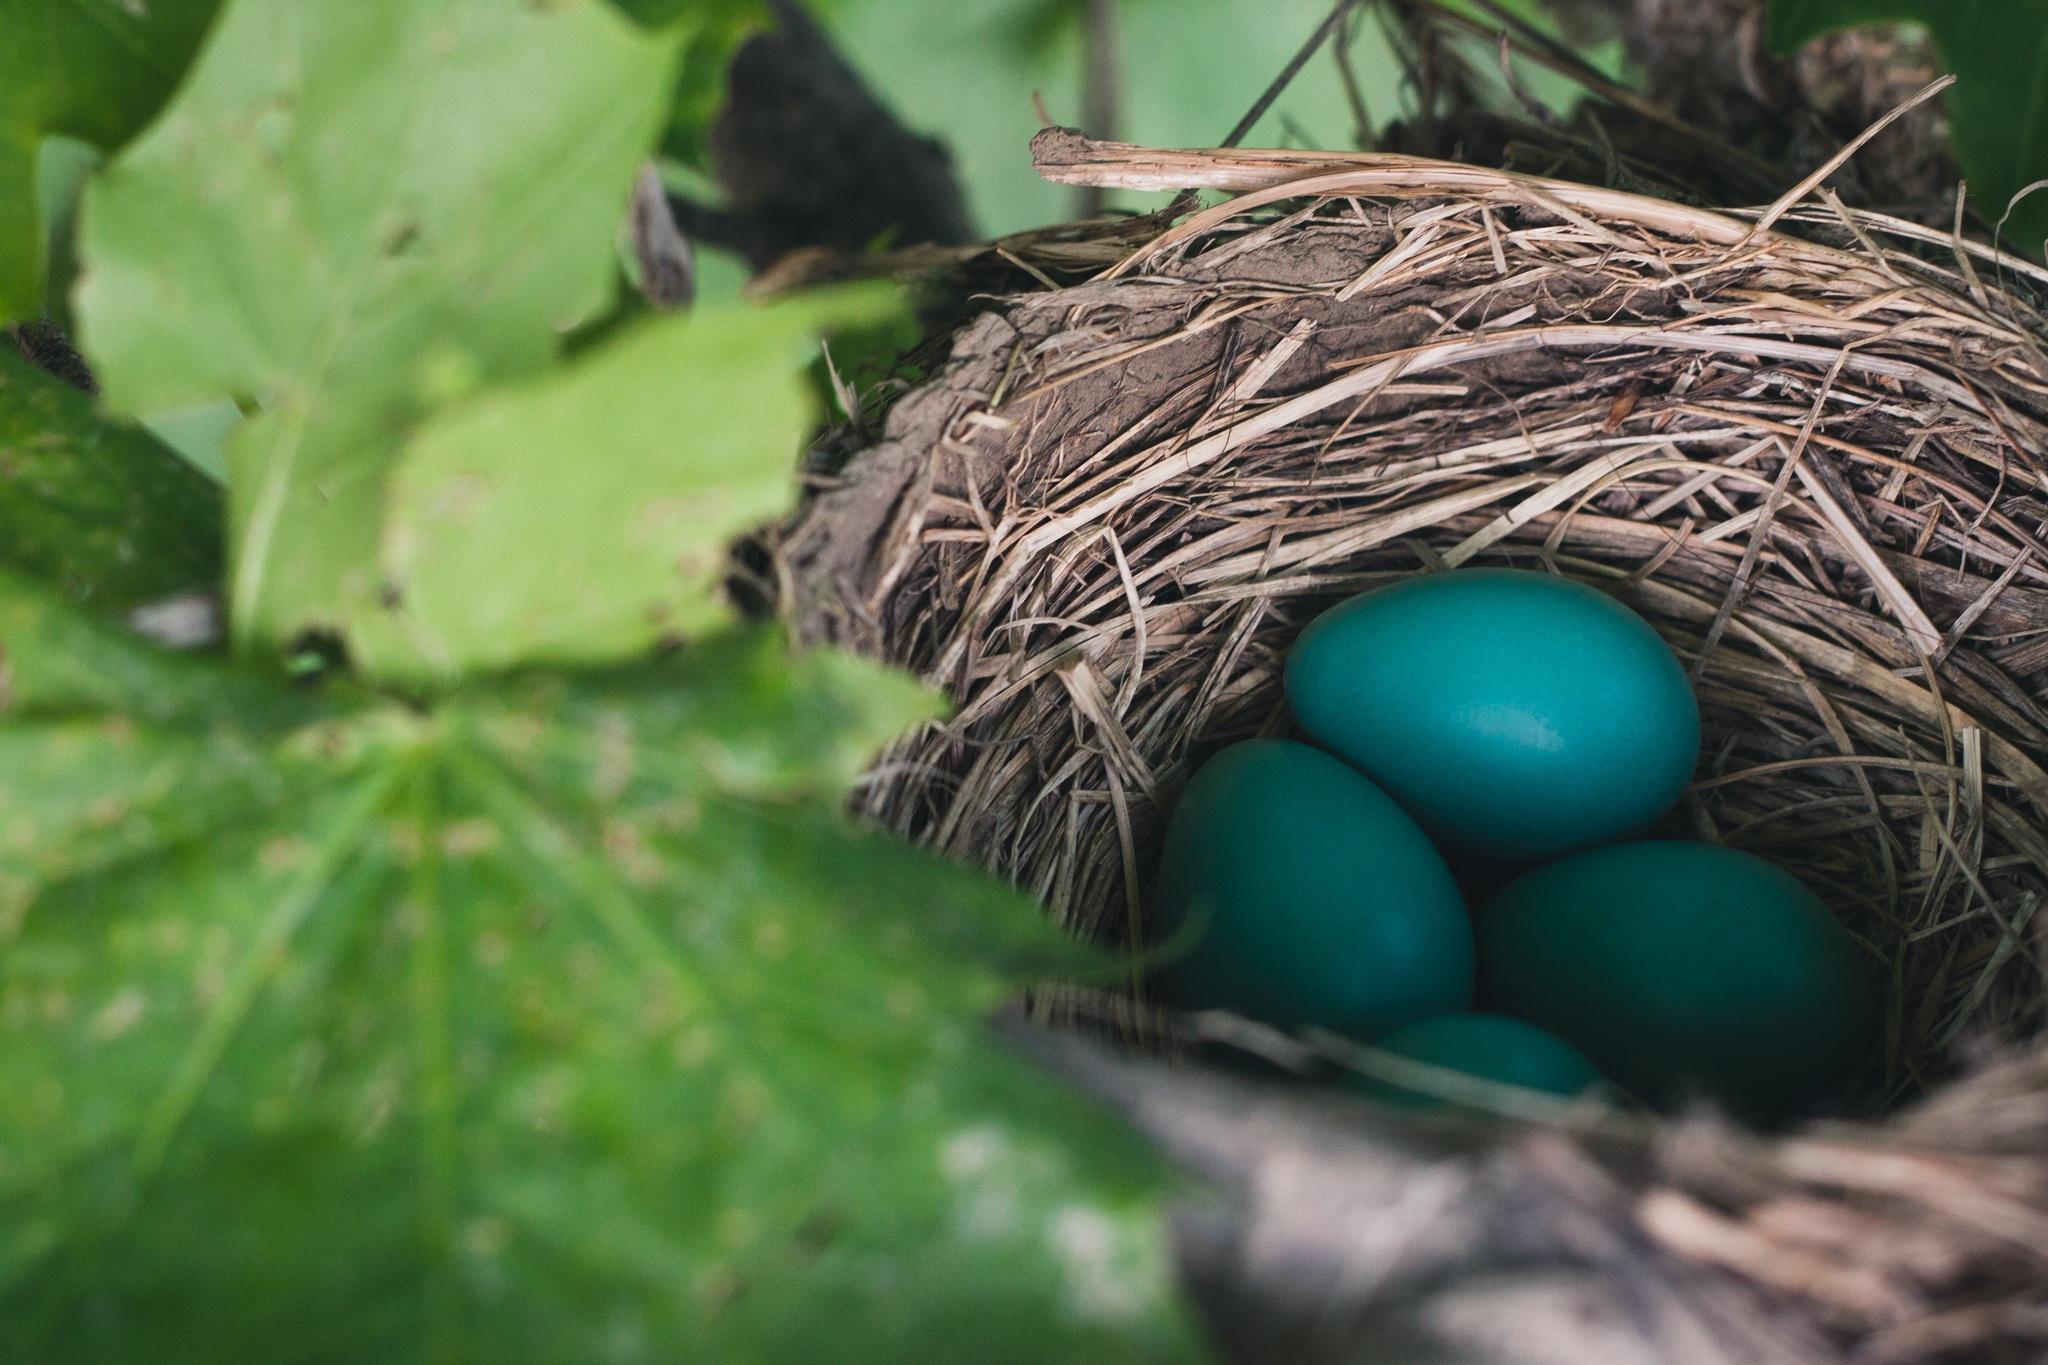 Green eggs, Bird, Birth, Cycle, Egg, HQ Photo